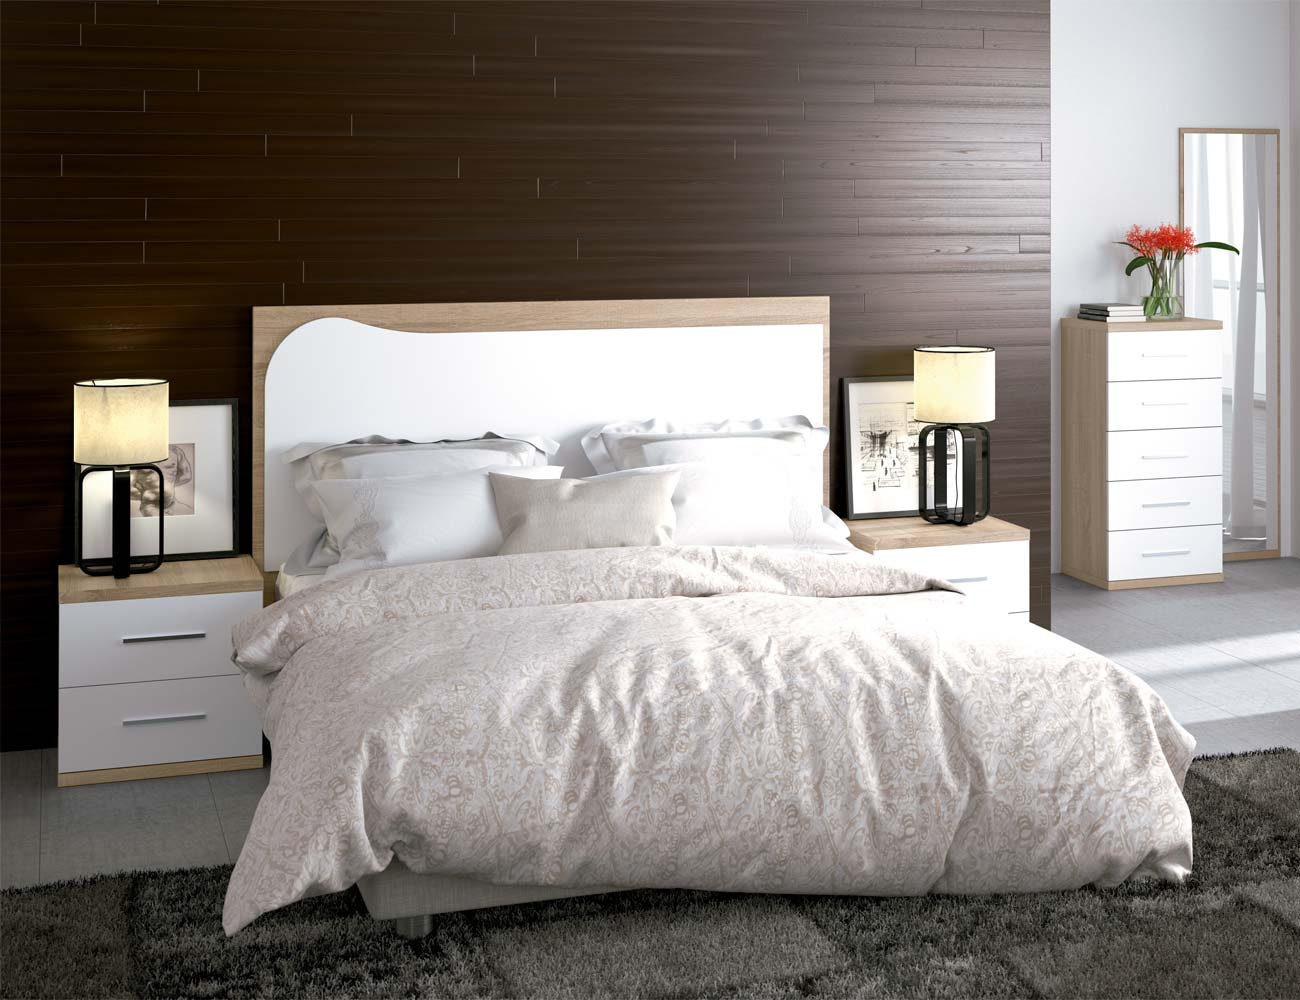 Dormitorio matrimonio moderno 18 cambrian blanco